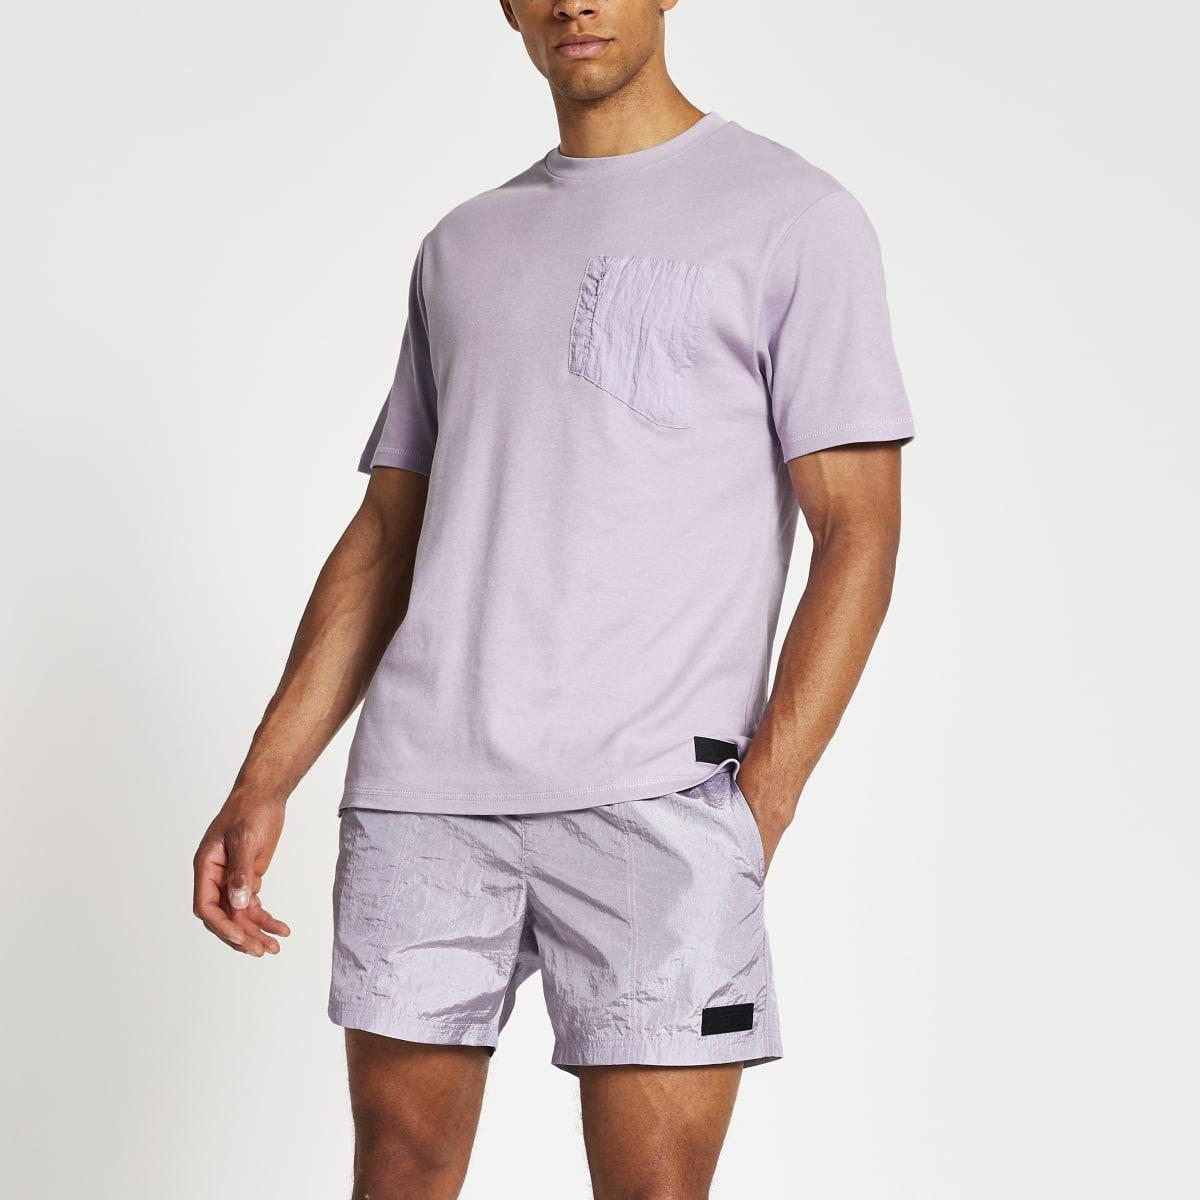 Pastel Tech purple nylon pocket T-shirt